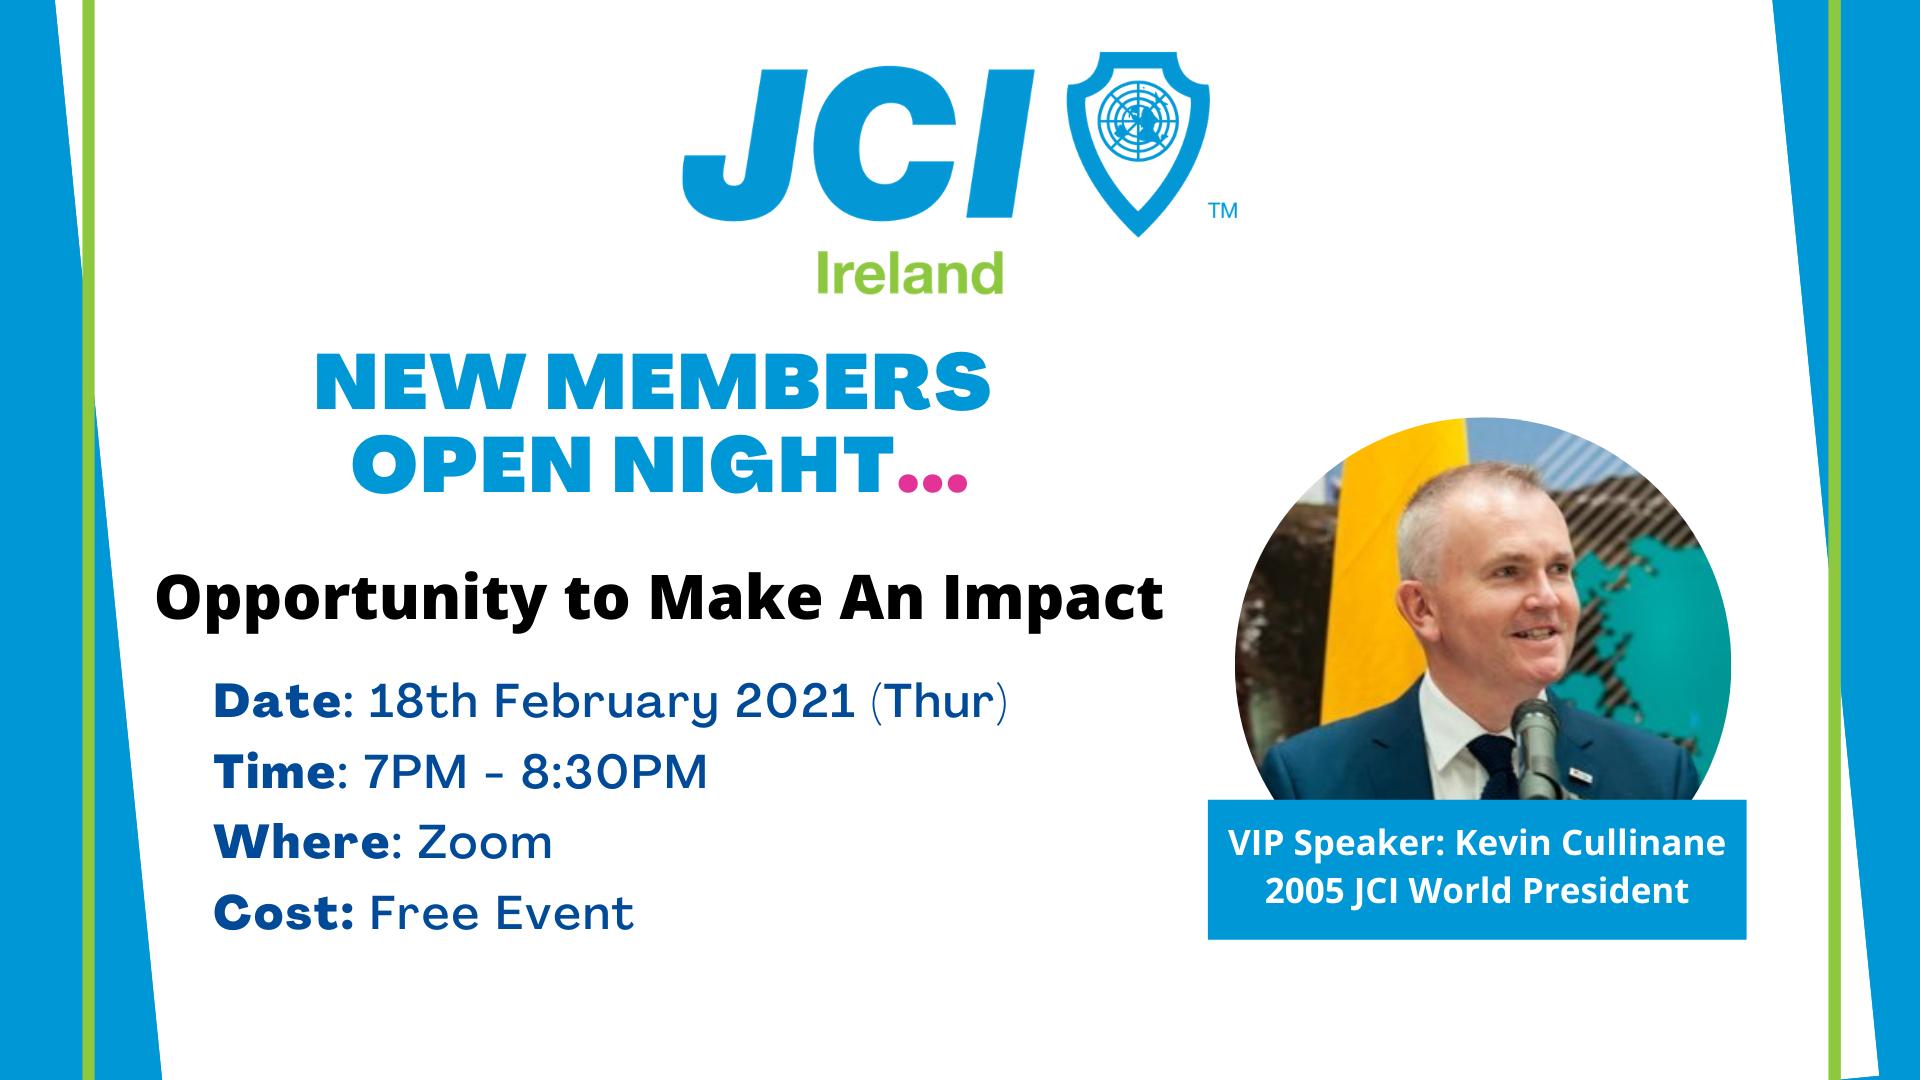 JCI Ireland New Members Open Night